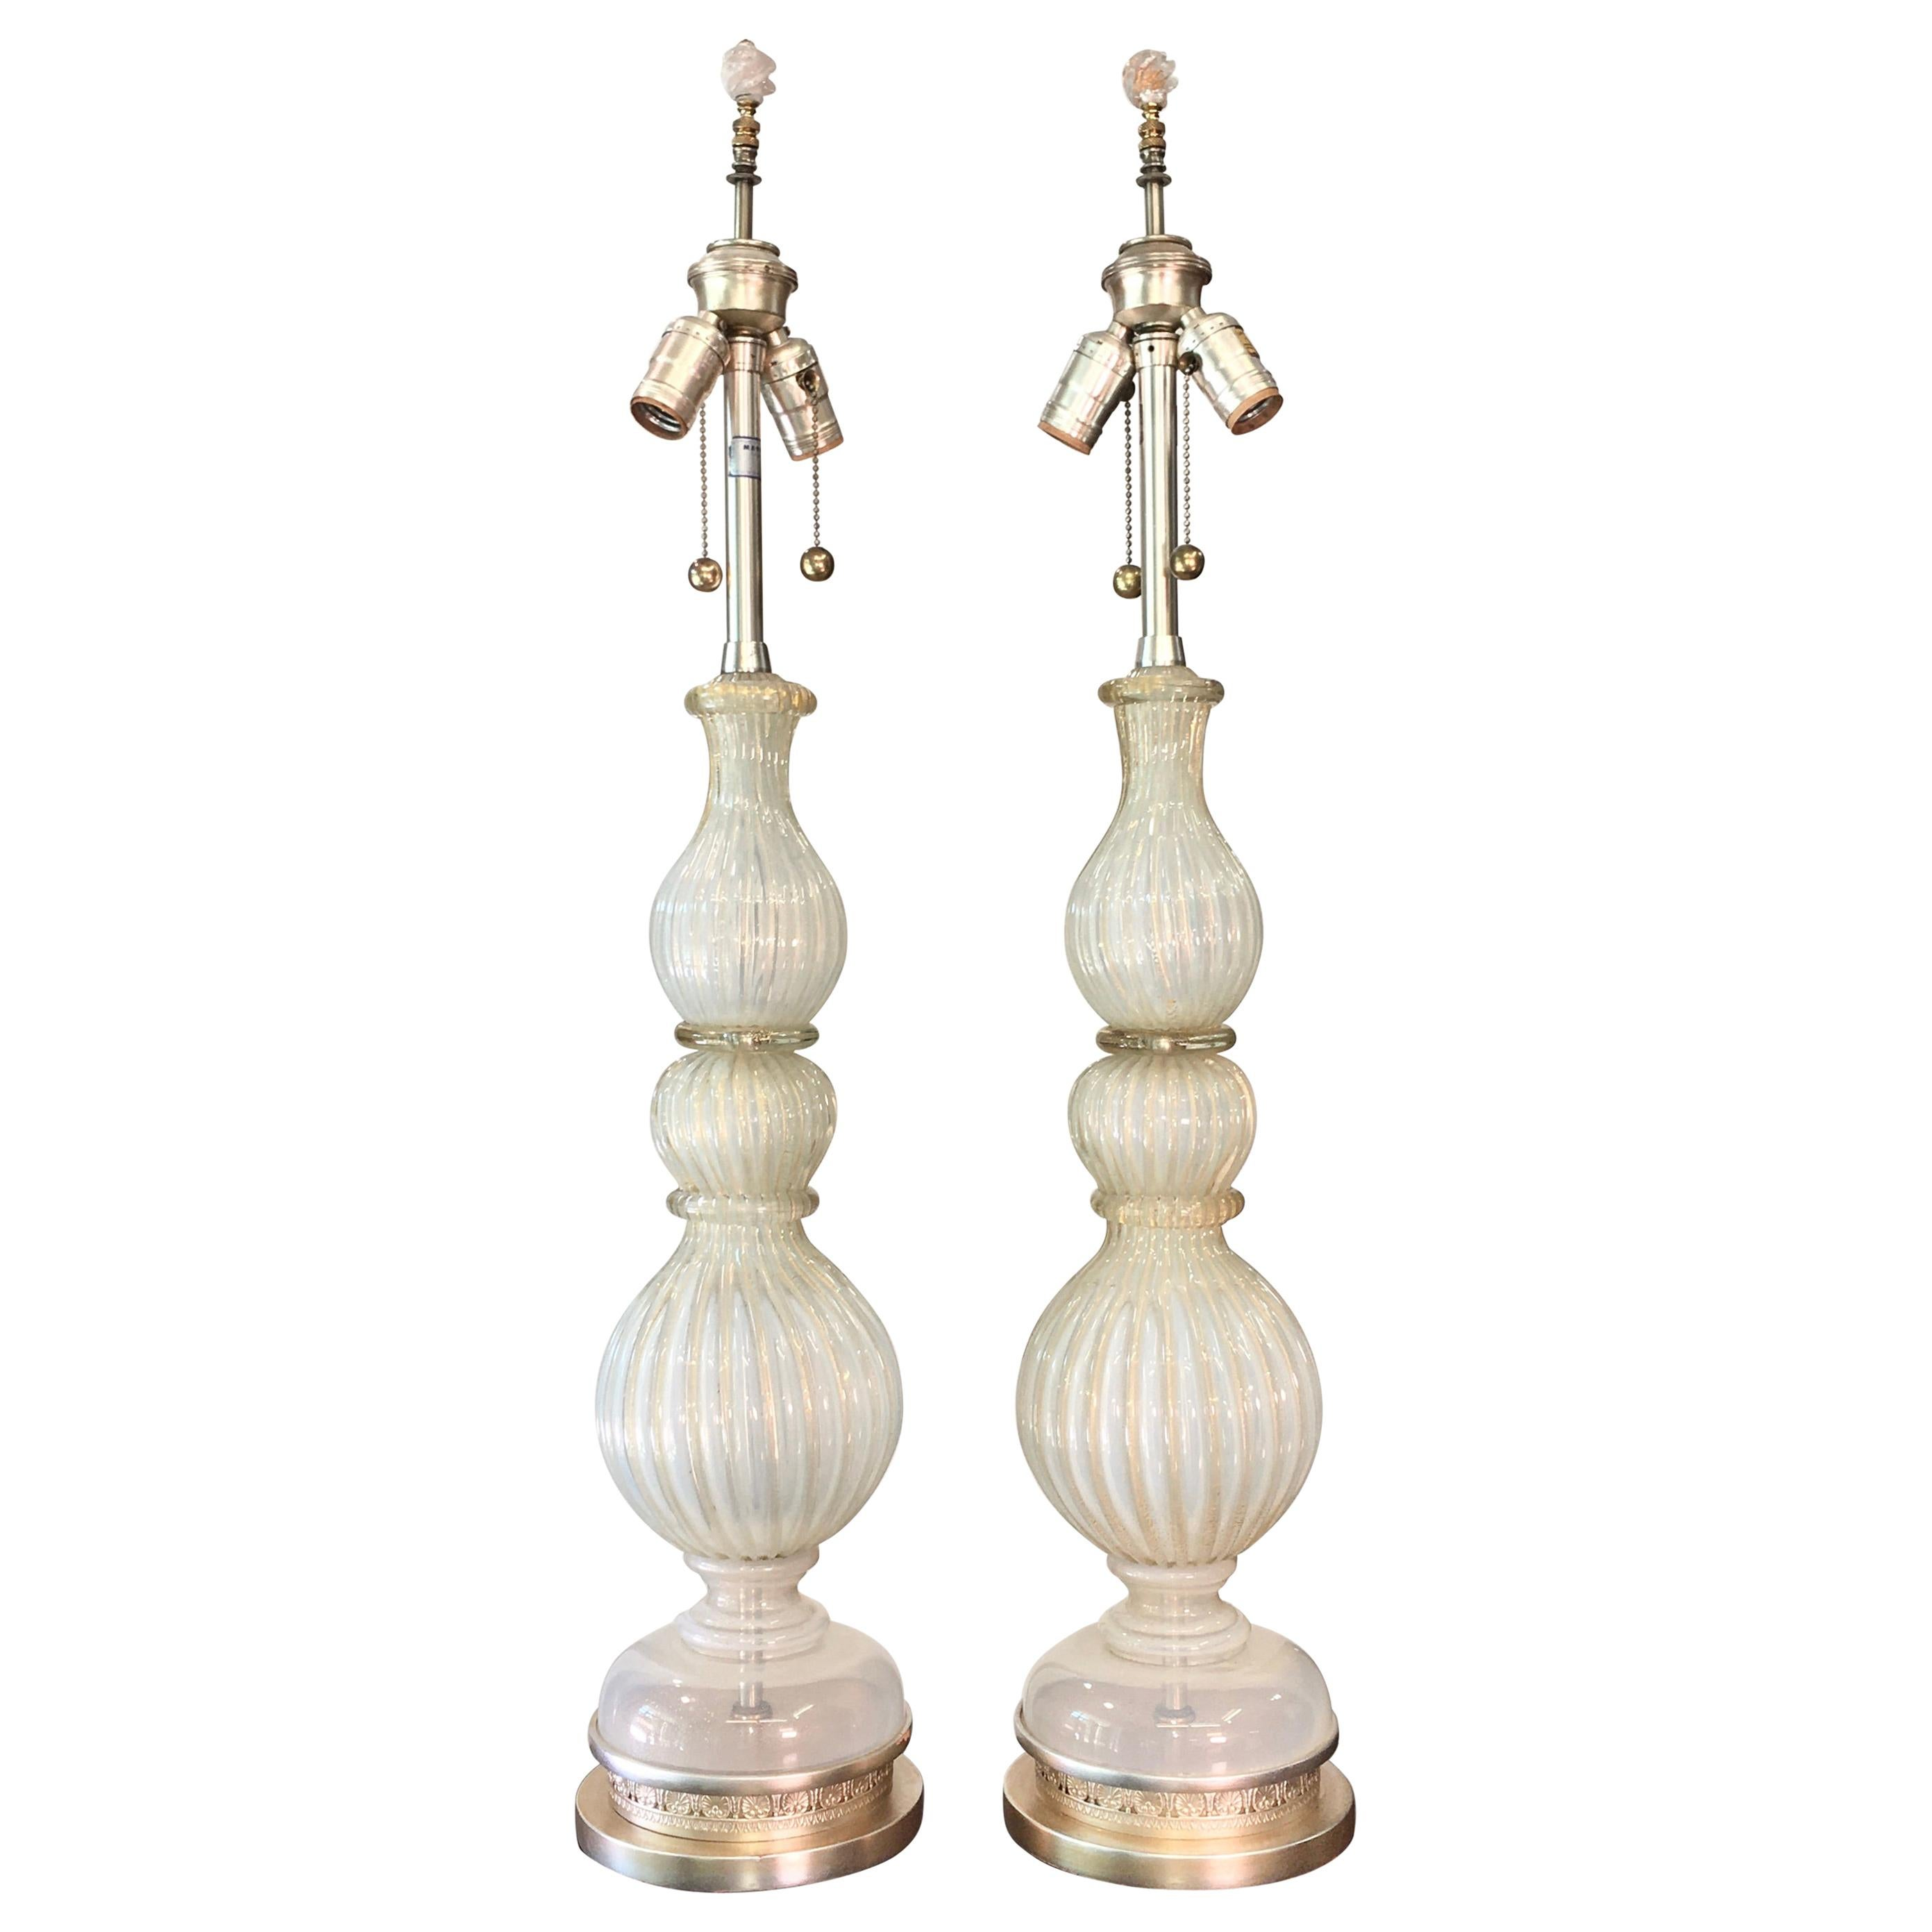 Pair of Seguso Murano Lamps by Marbro